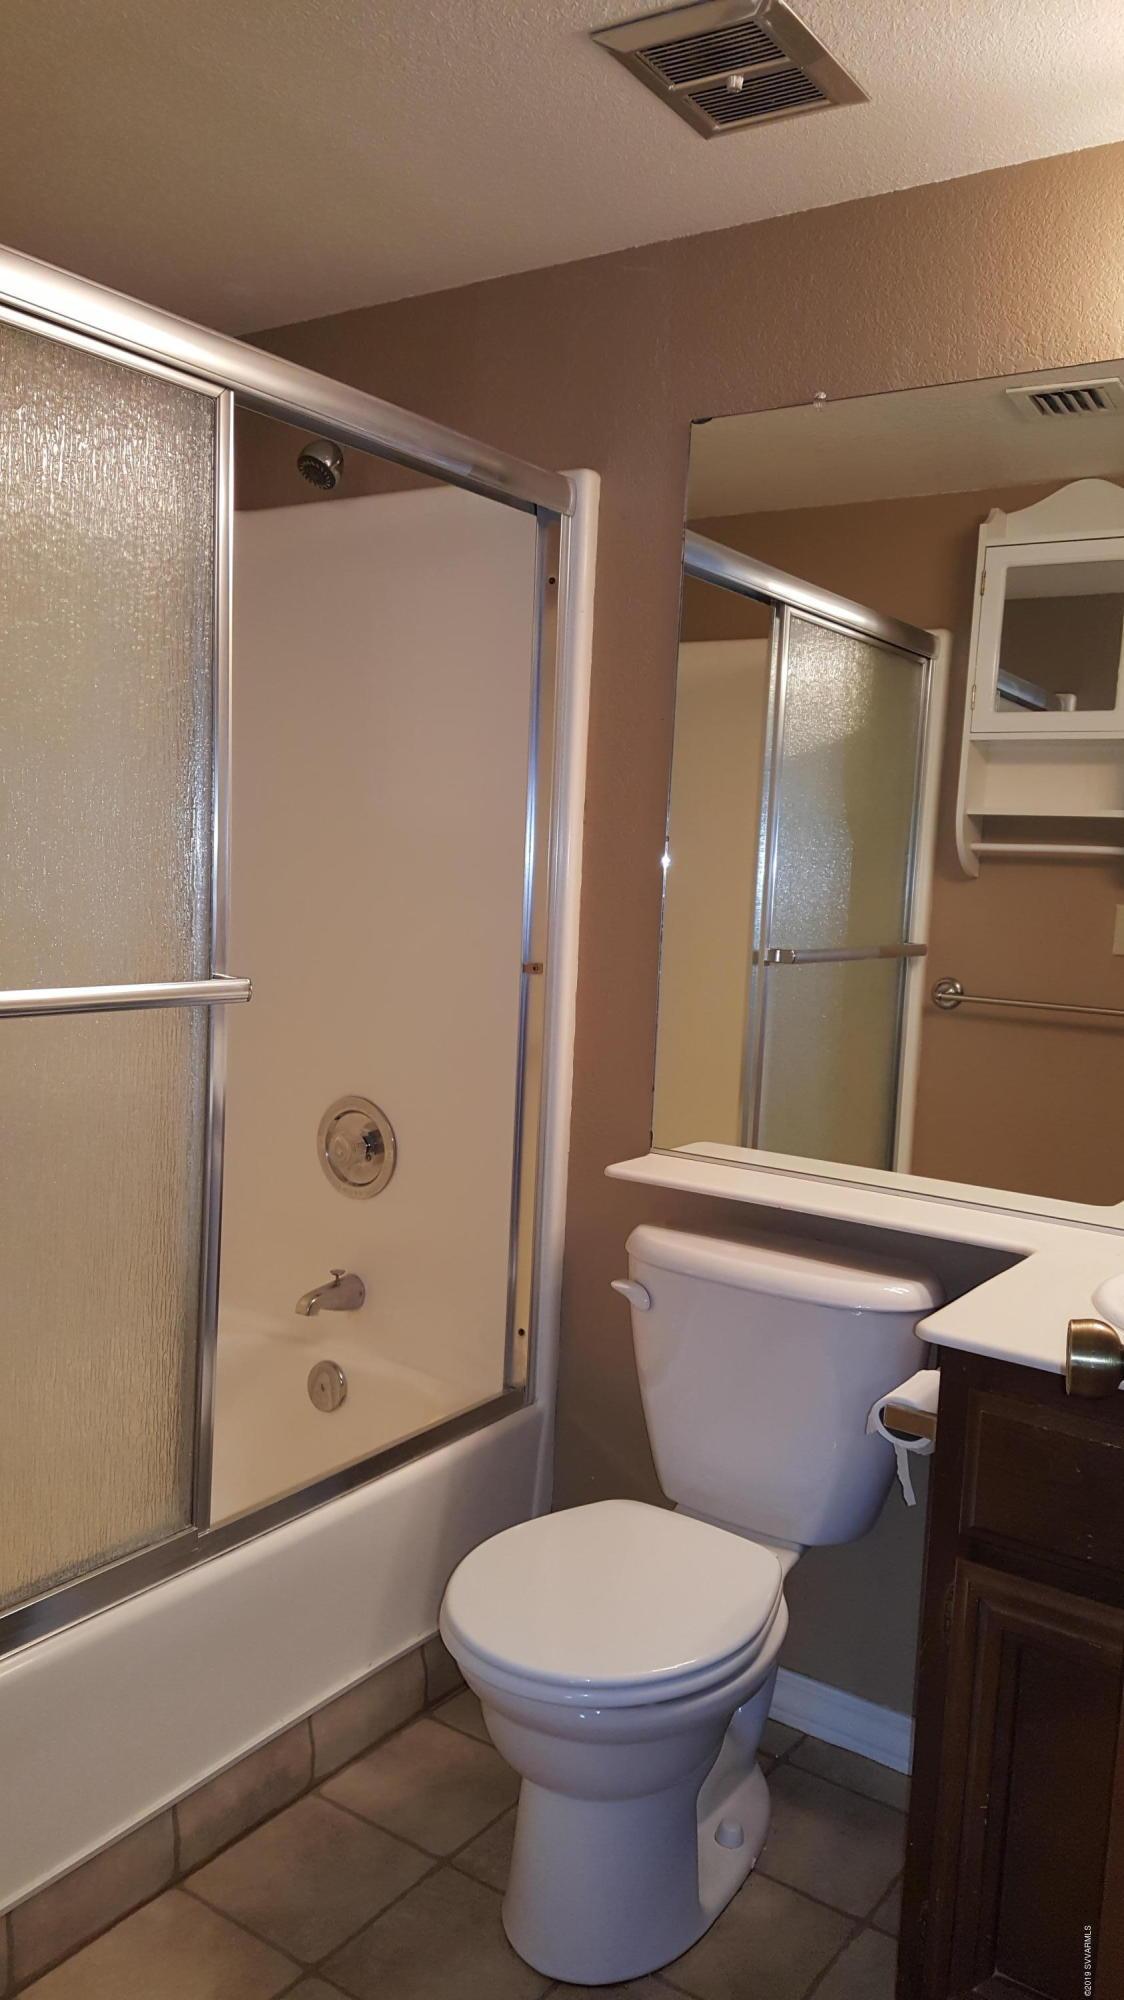 405 Fairway Oaks Drive Sedona, AZ 86351